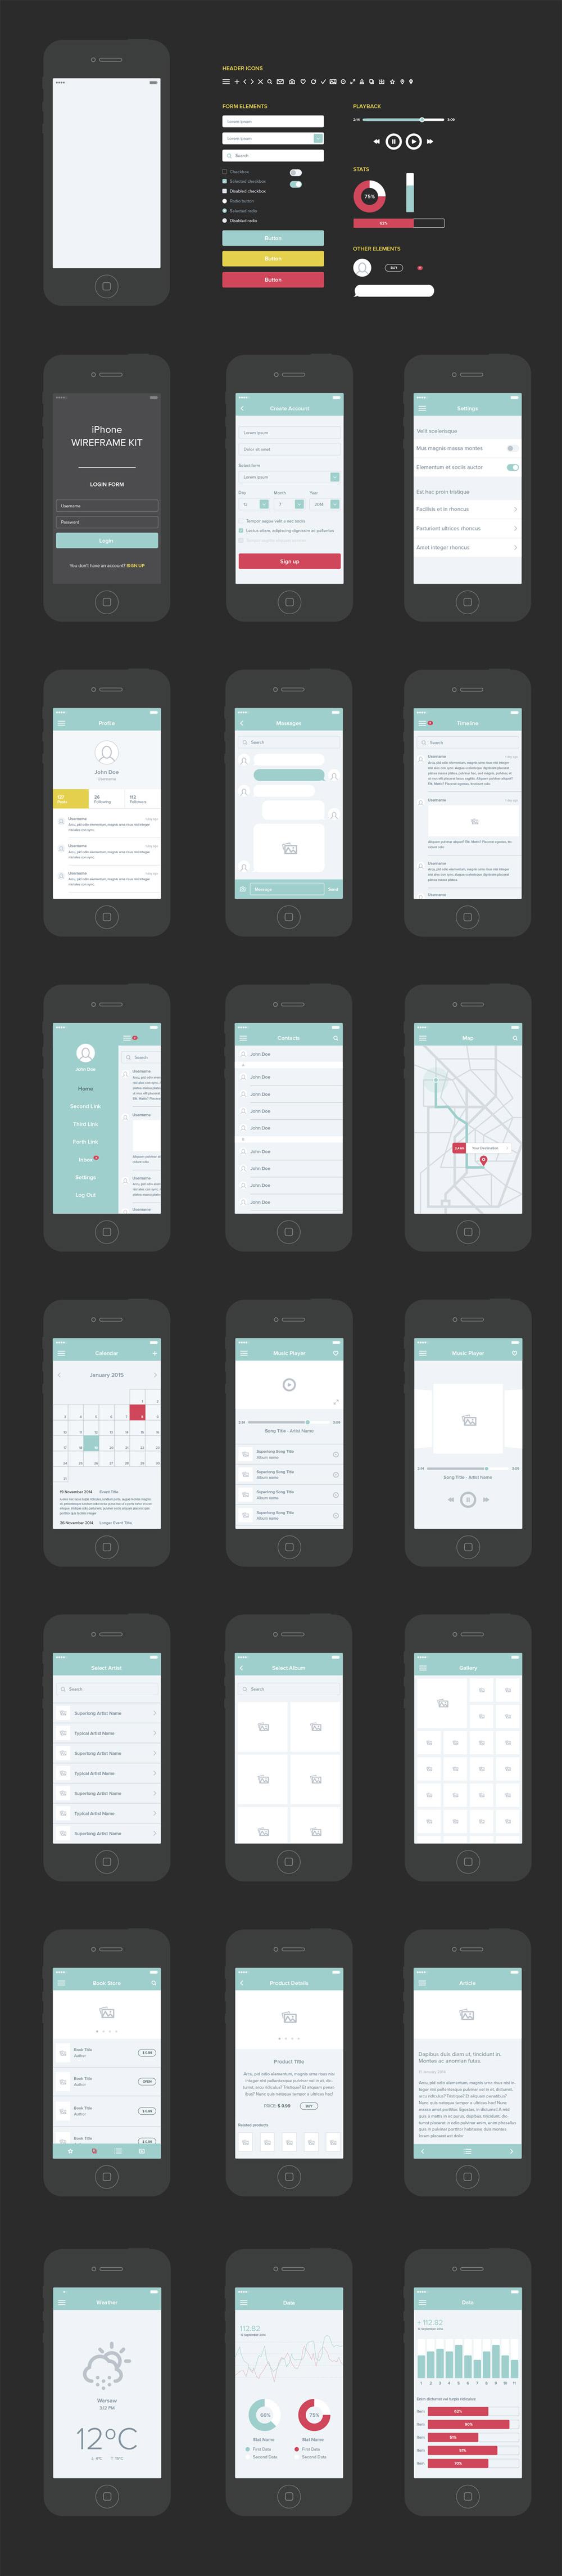 free-mobile-app-ui-kit